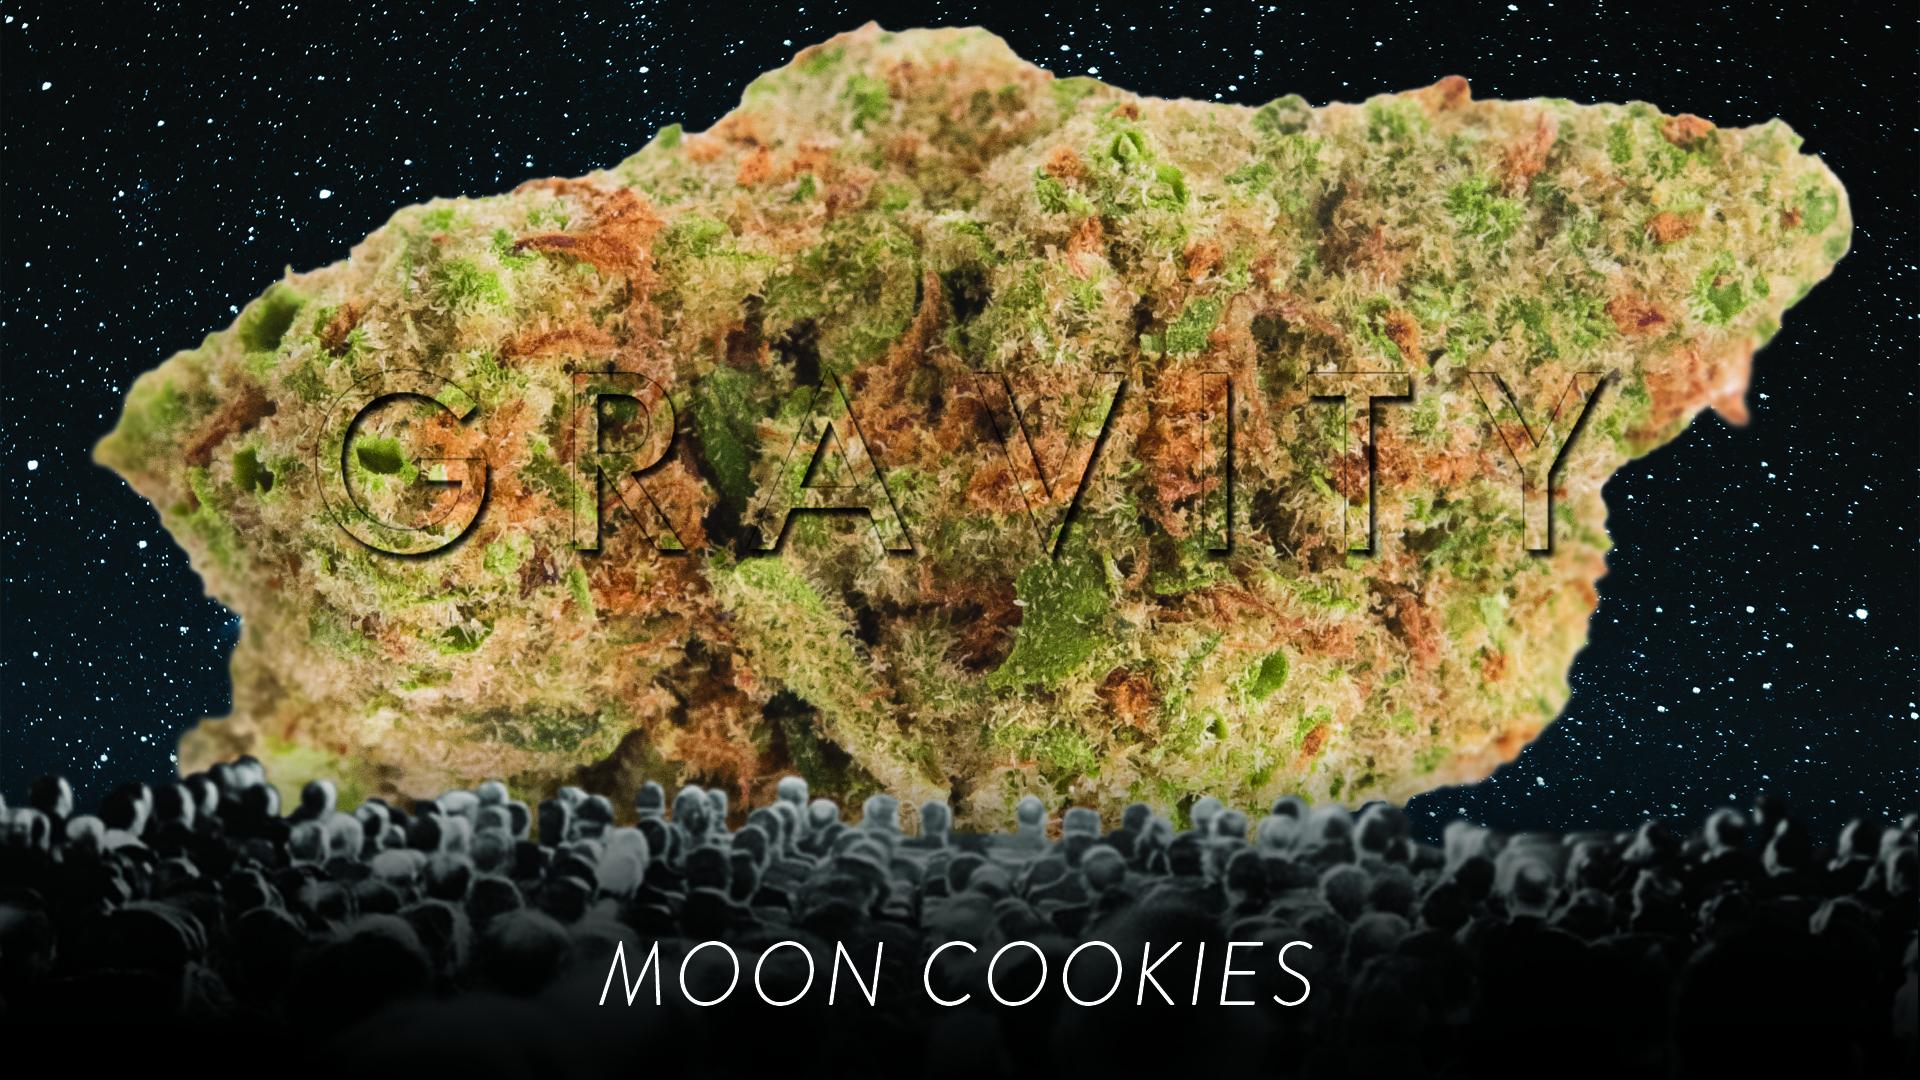 Headlight-Cannabis-Moon-Cookies-Far-Out-Films.jpg